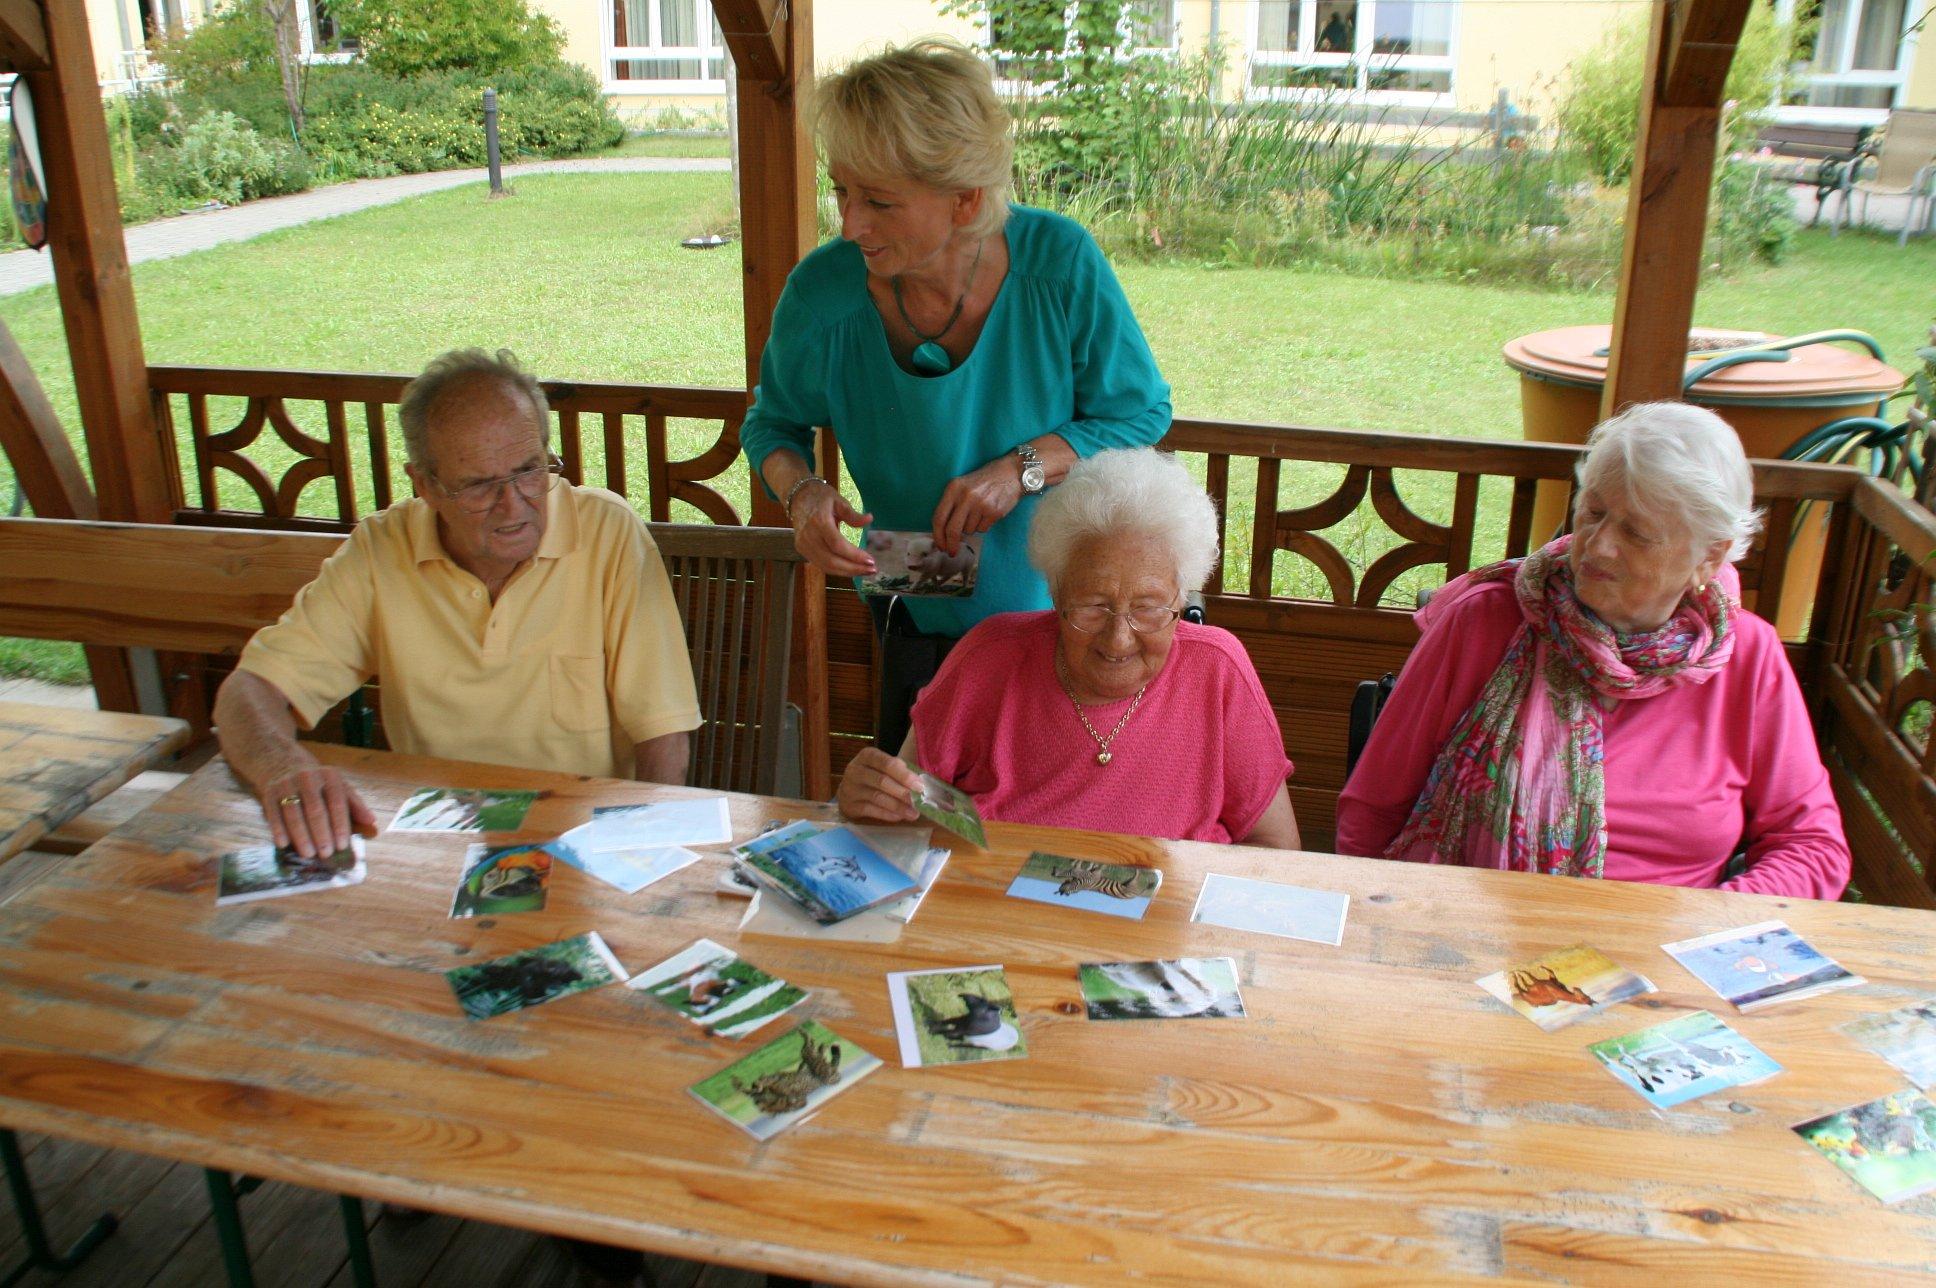 seniorenbetreuung-muenchen-lebensfreude-66-plus-gedaechtnistraining